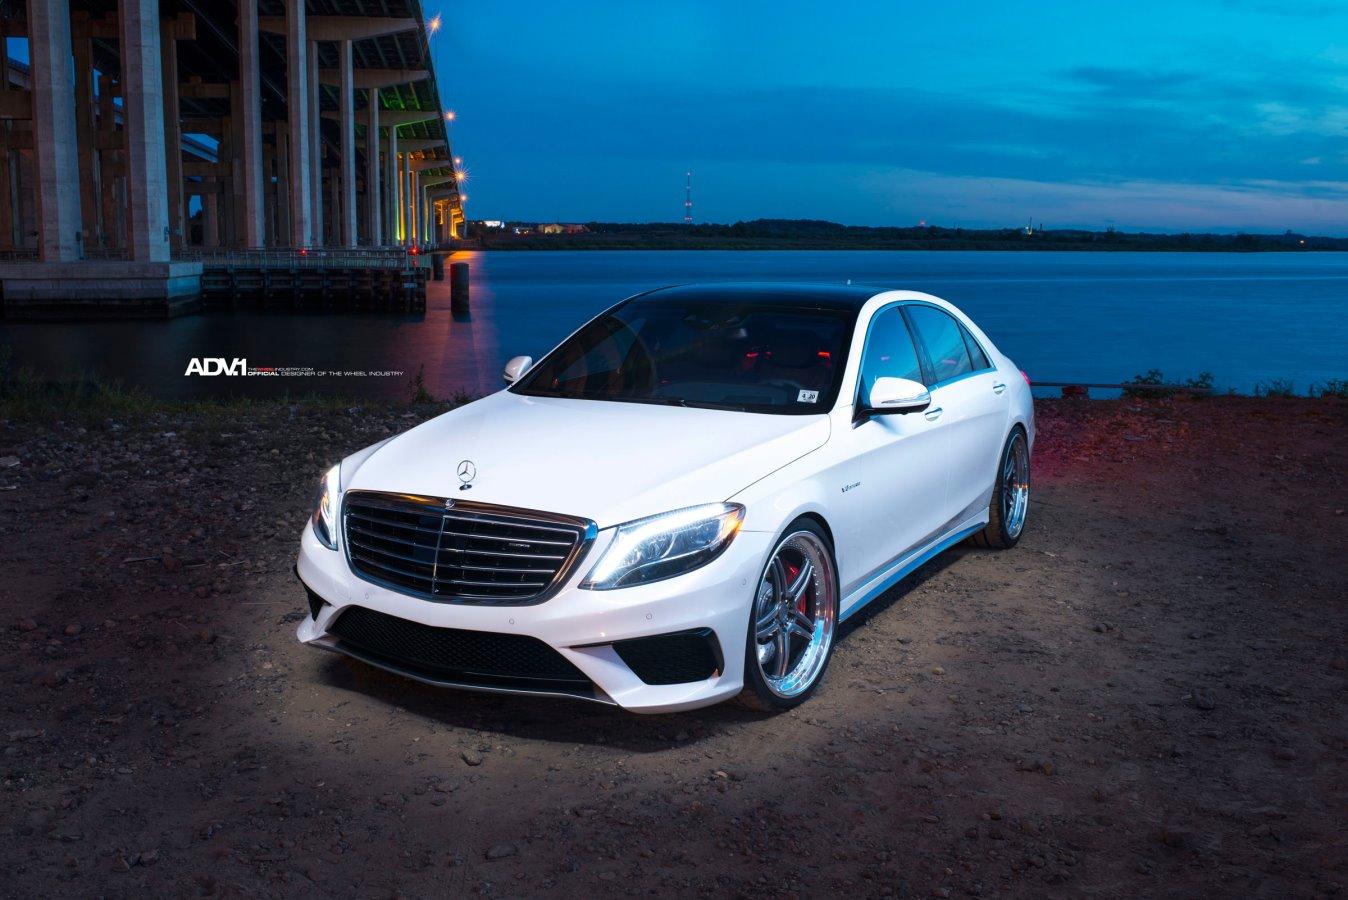 2016 mercedes benz w222 s63 amg on adv05 adv 1 wheels for Mercedes benz 563 amg